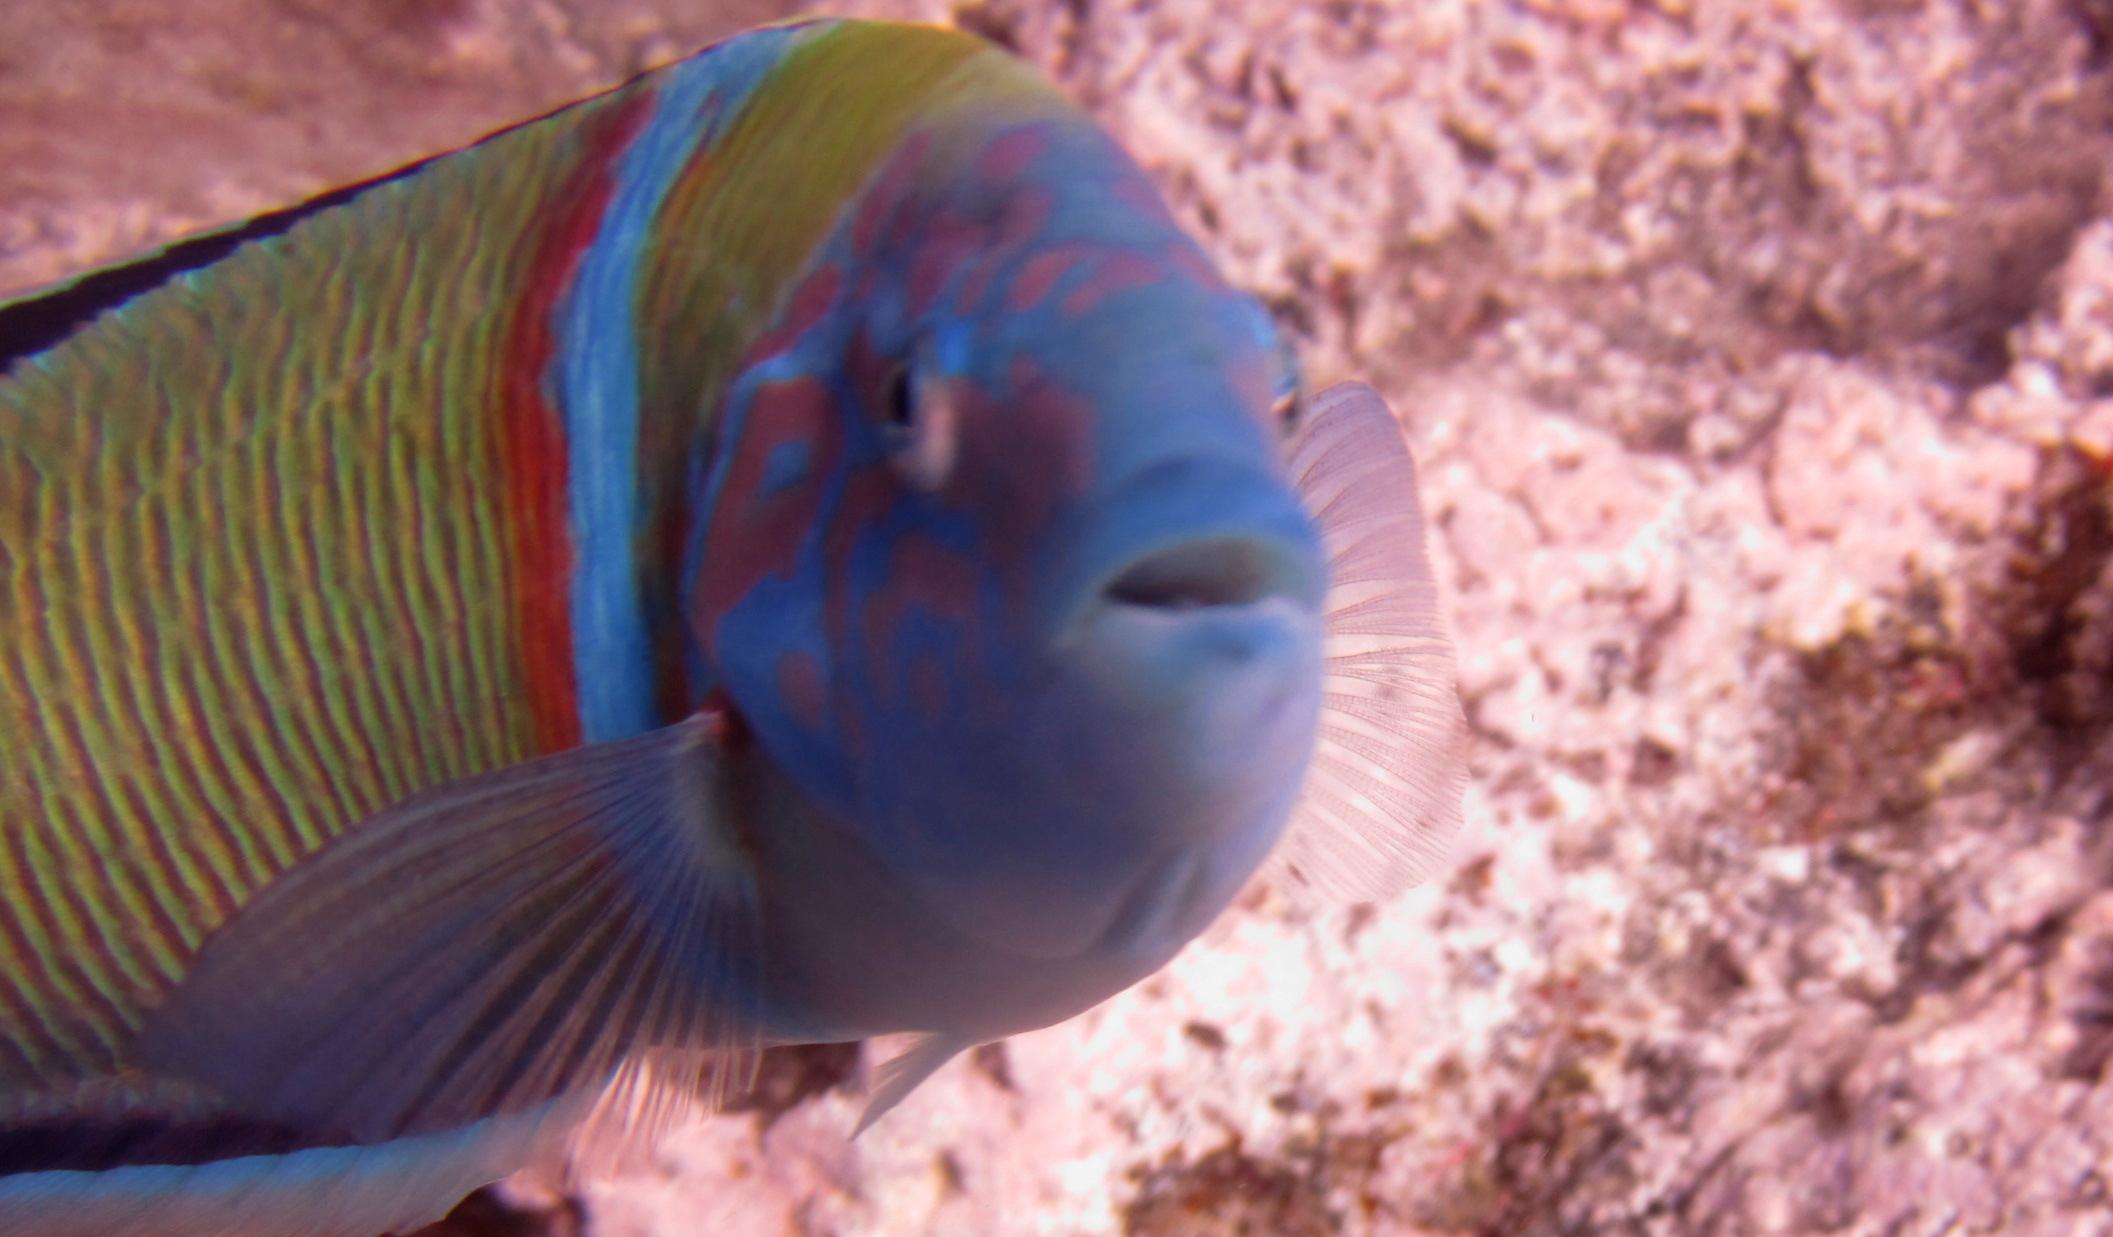 Diving-Tenerife-Aquatic-Life-Sharks-Sting-Rays-Fish (18)